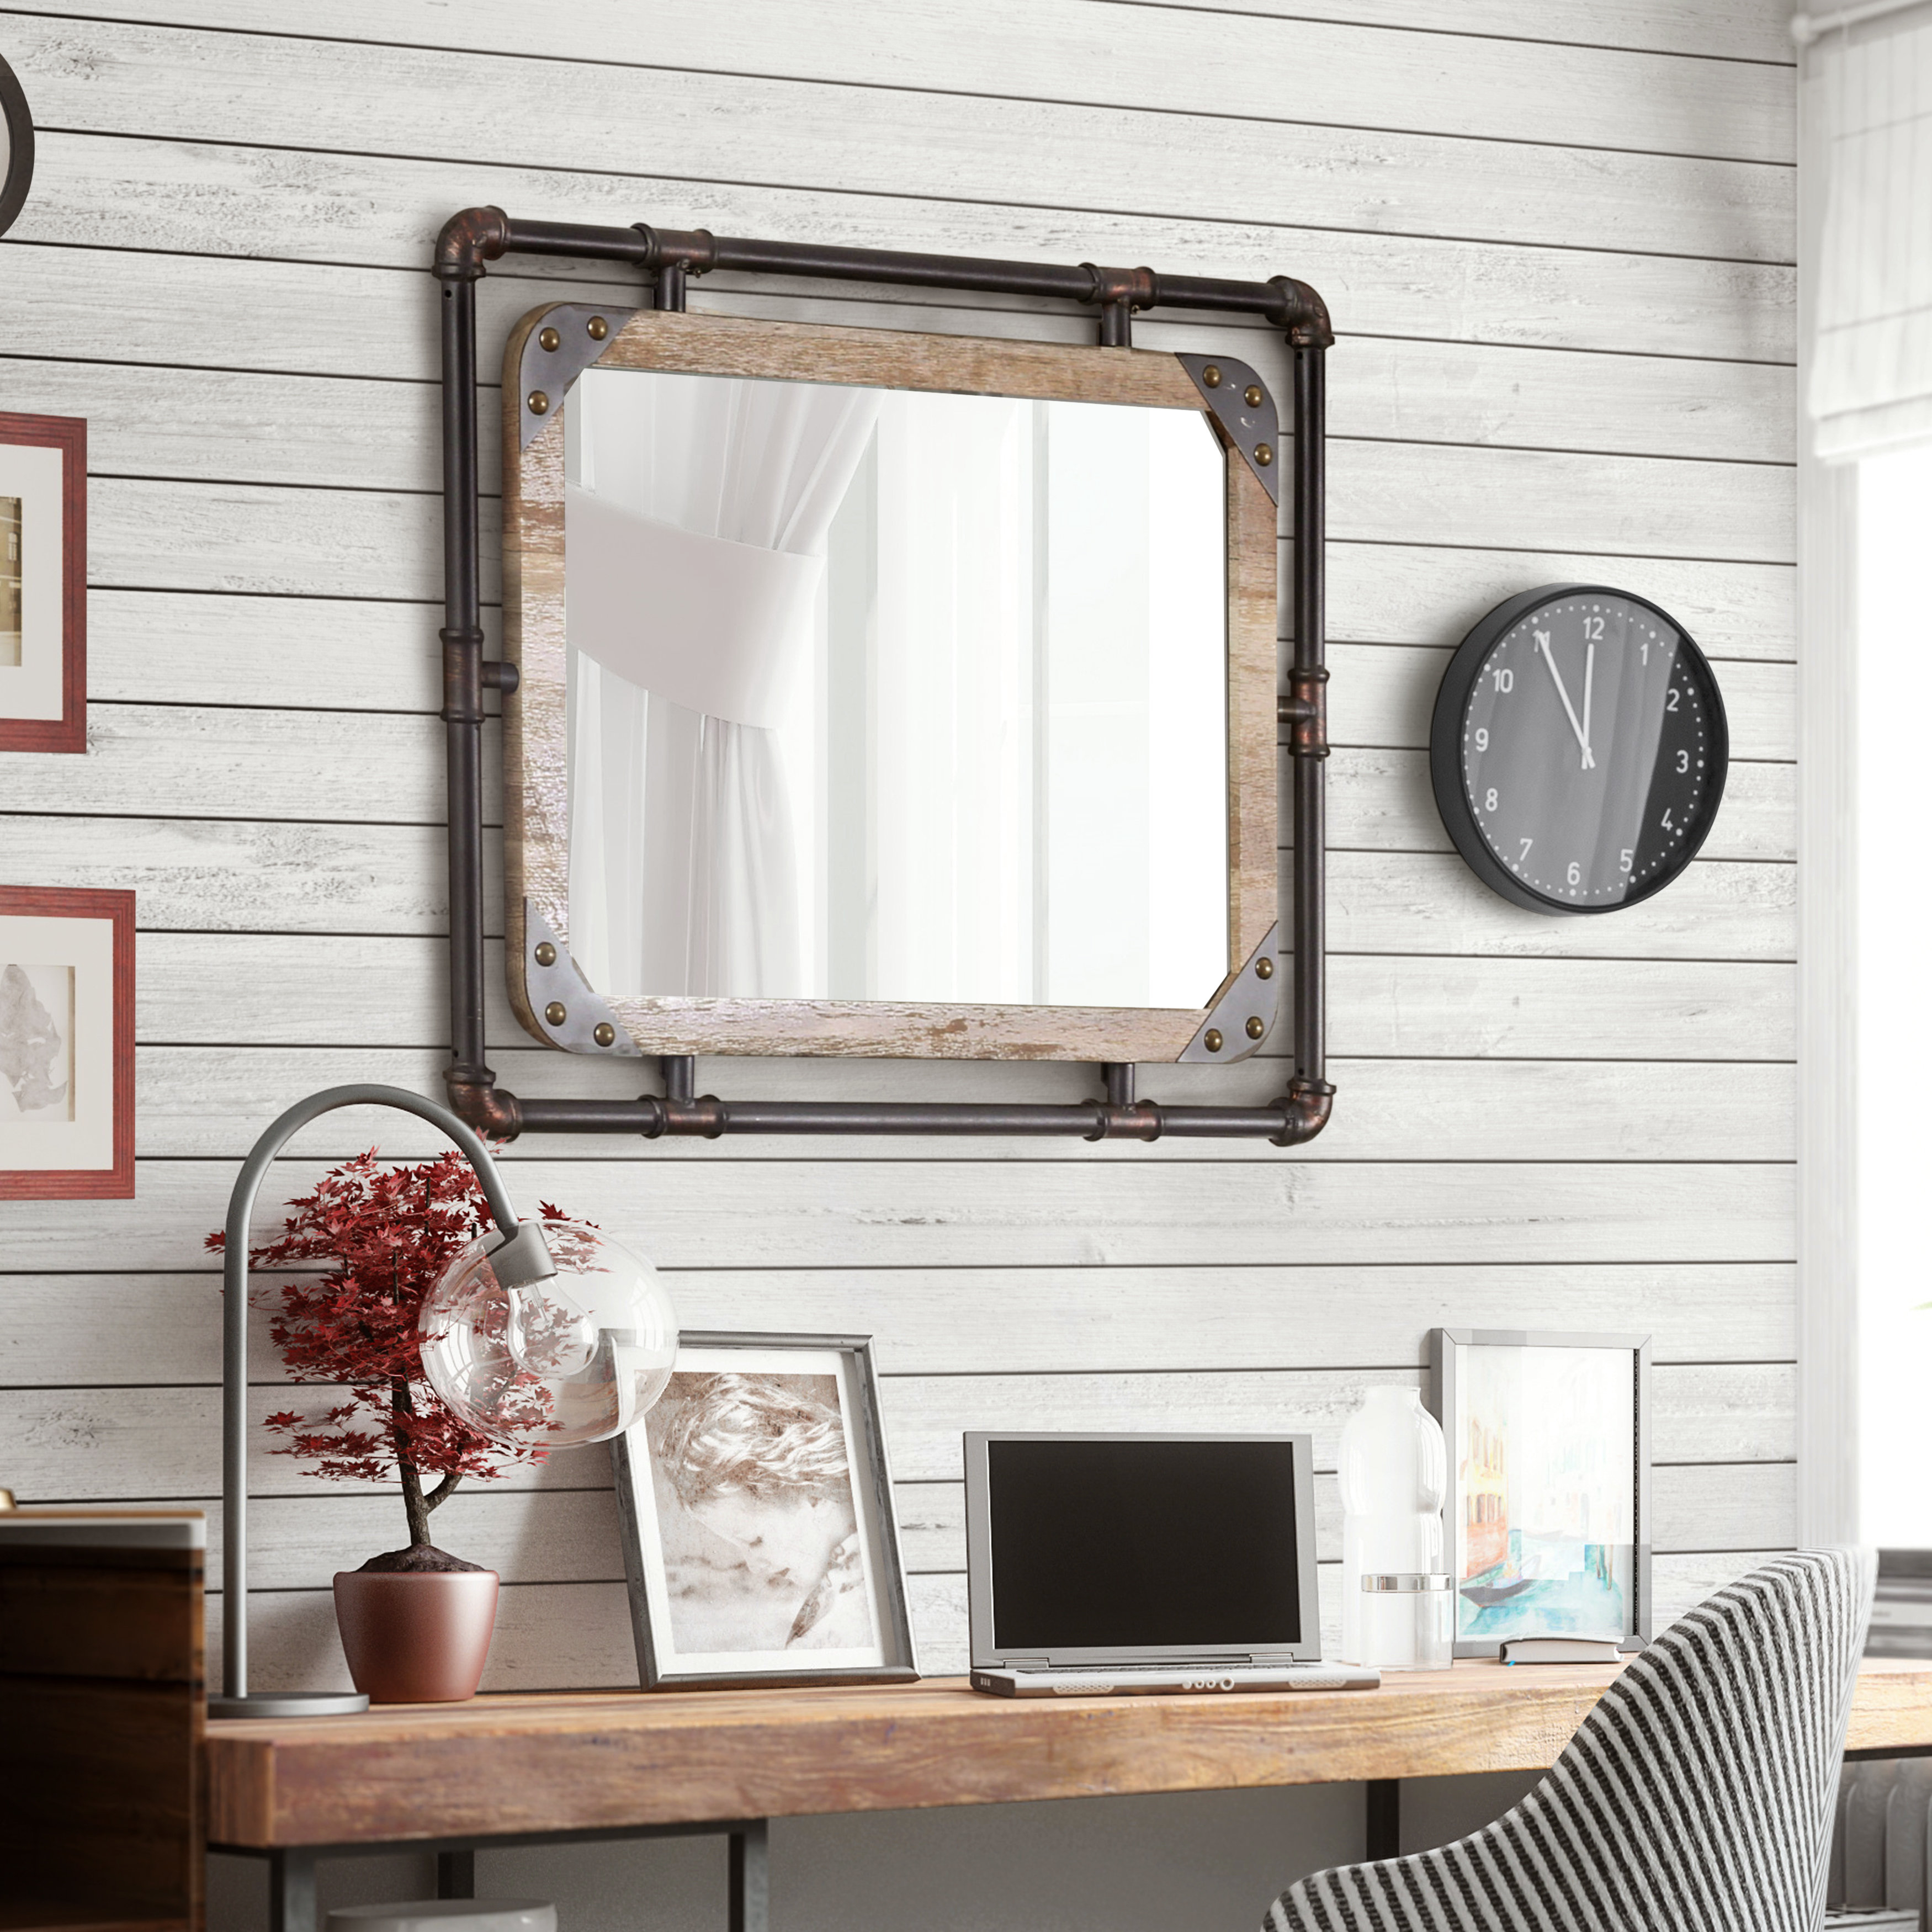 Capri Bathroom Mirror Pertaining To Peetz Modern Rustic Accent Mirrors (Image 6 of 30)